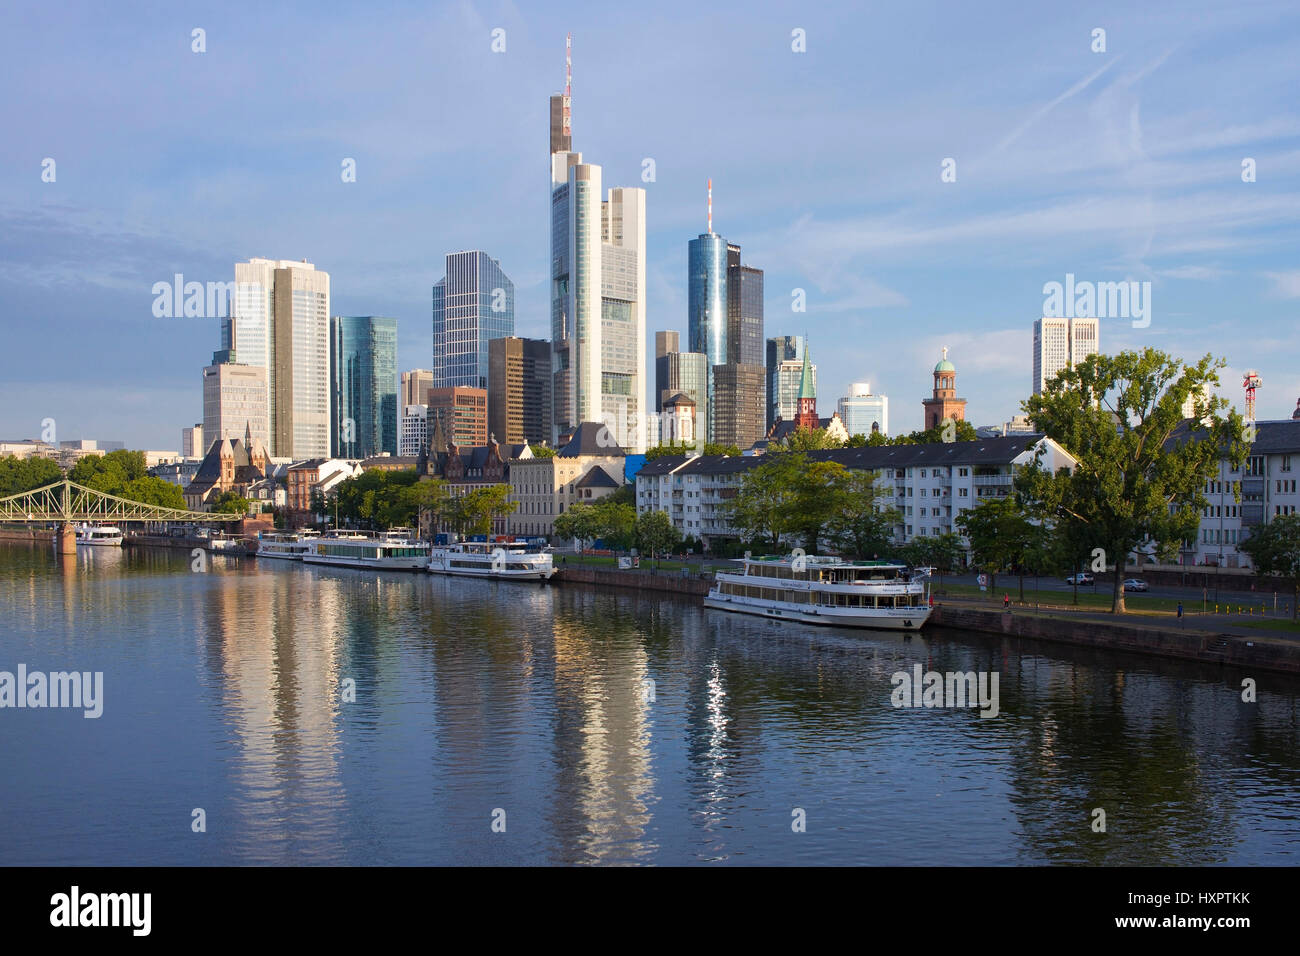 Germany, Hessen, Frankfurt am Main, bank quarter, Deutschland,Hessen,Frankfurt am Main,Bankenviertel - Stock Image